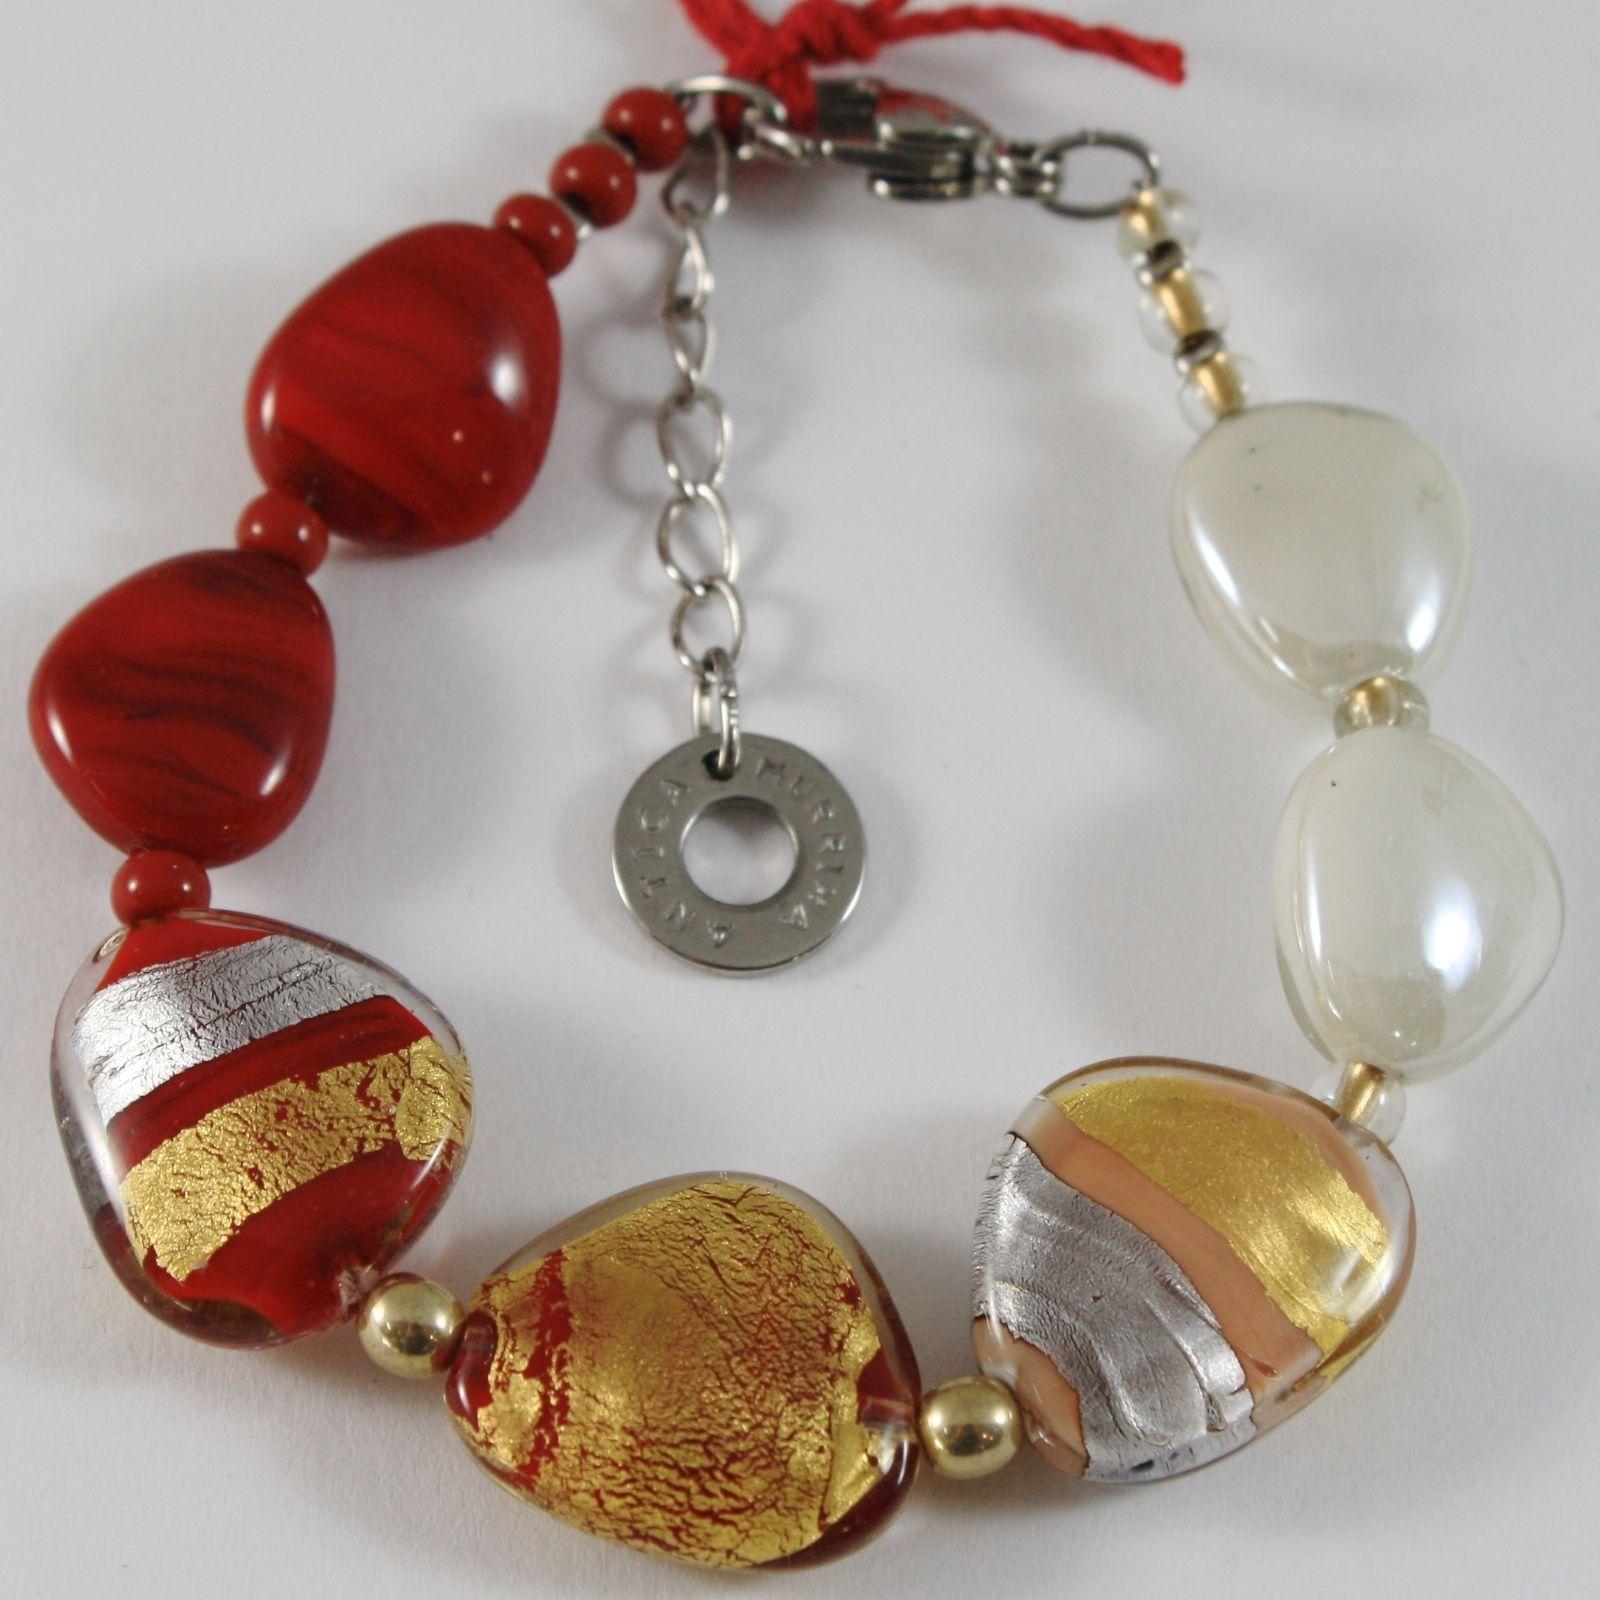 Bracelet Antica Murrina Venezia with Murano Glass Red & Beige Br747a11